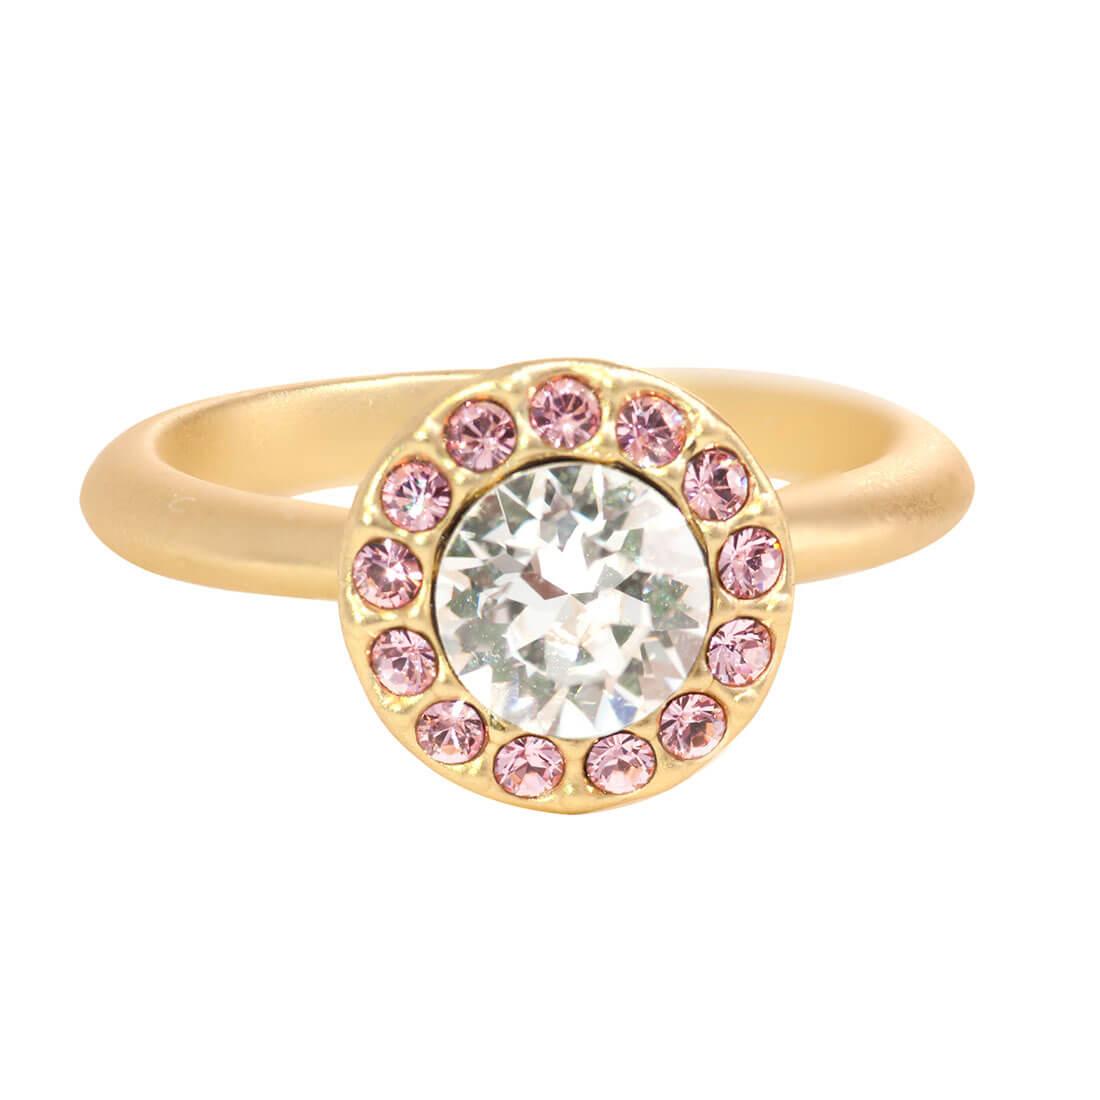 Swarovski Crystal Pink Halo Ring - 14k Gold